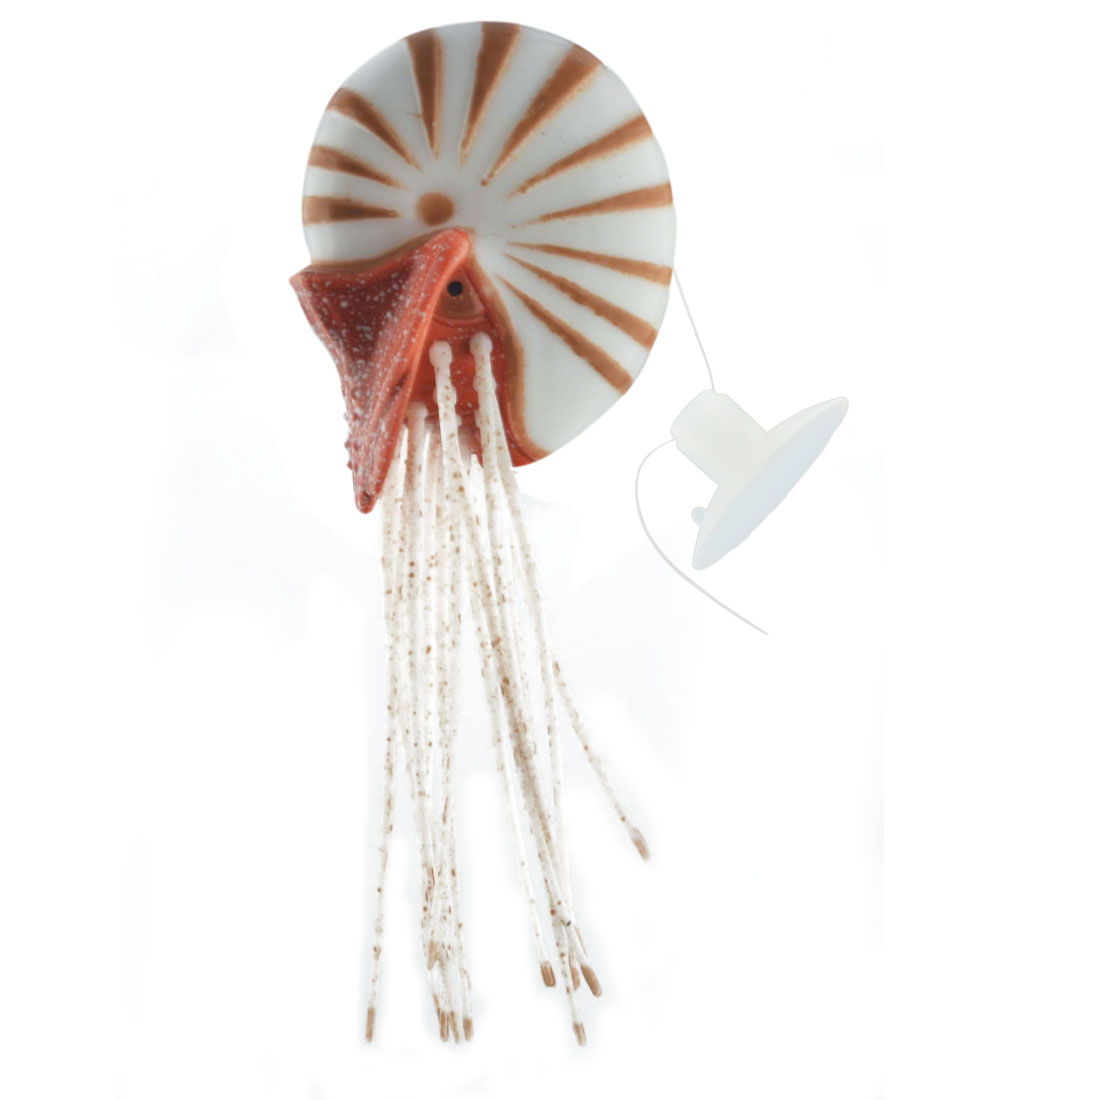 Aquarium Plastic Manmade Artificial Floating Conch Design Decoration Ornament Brown